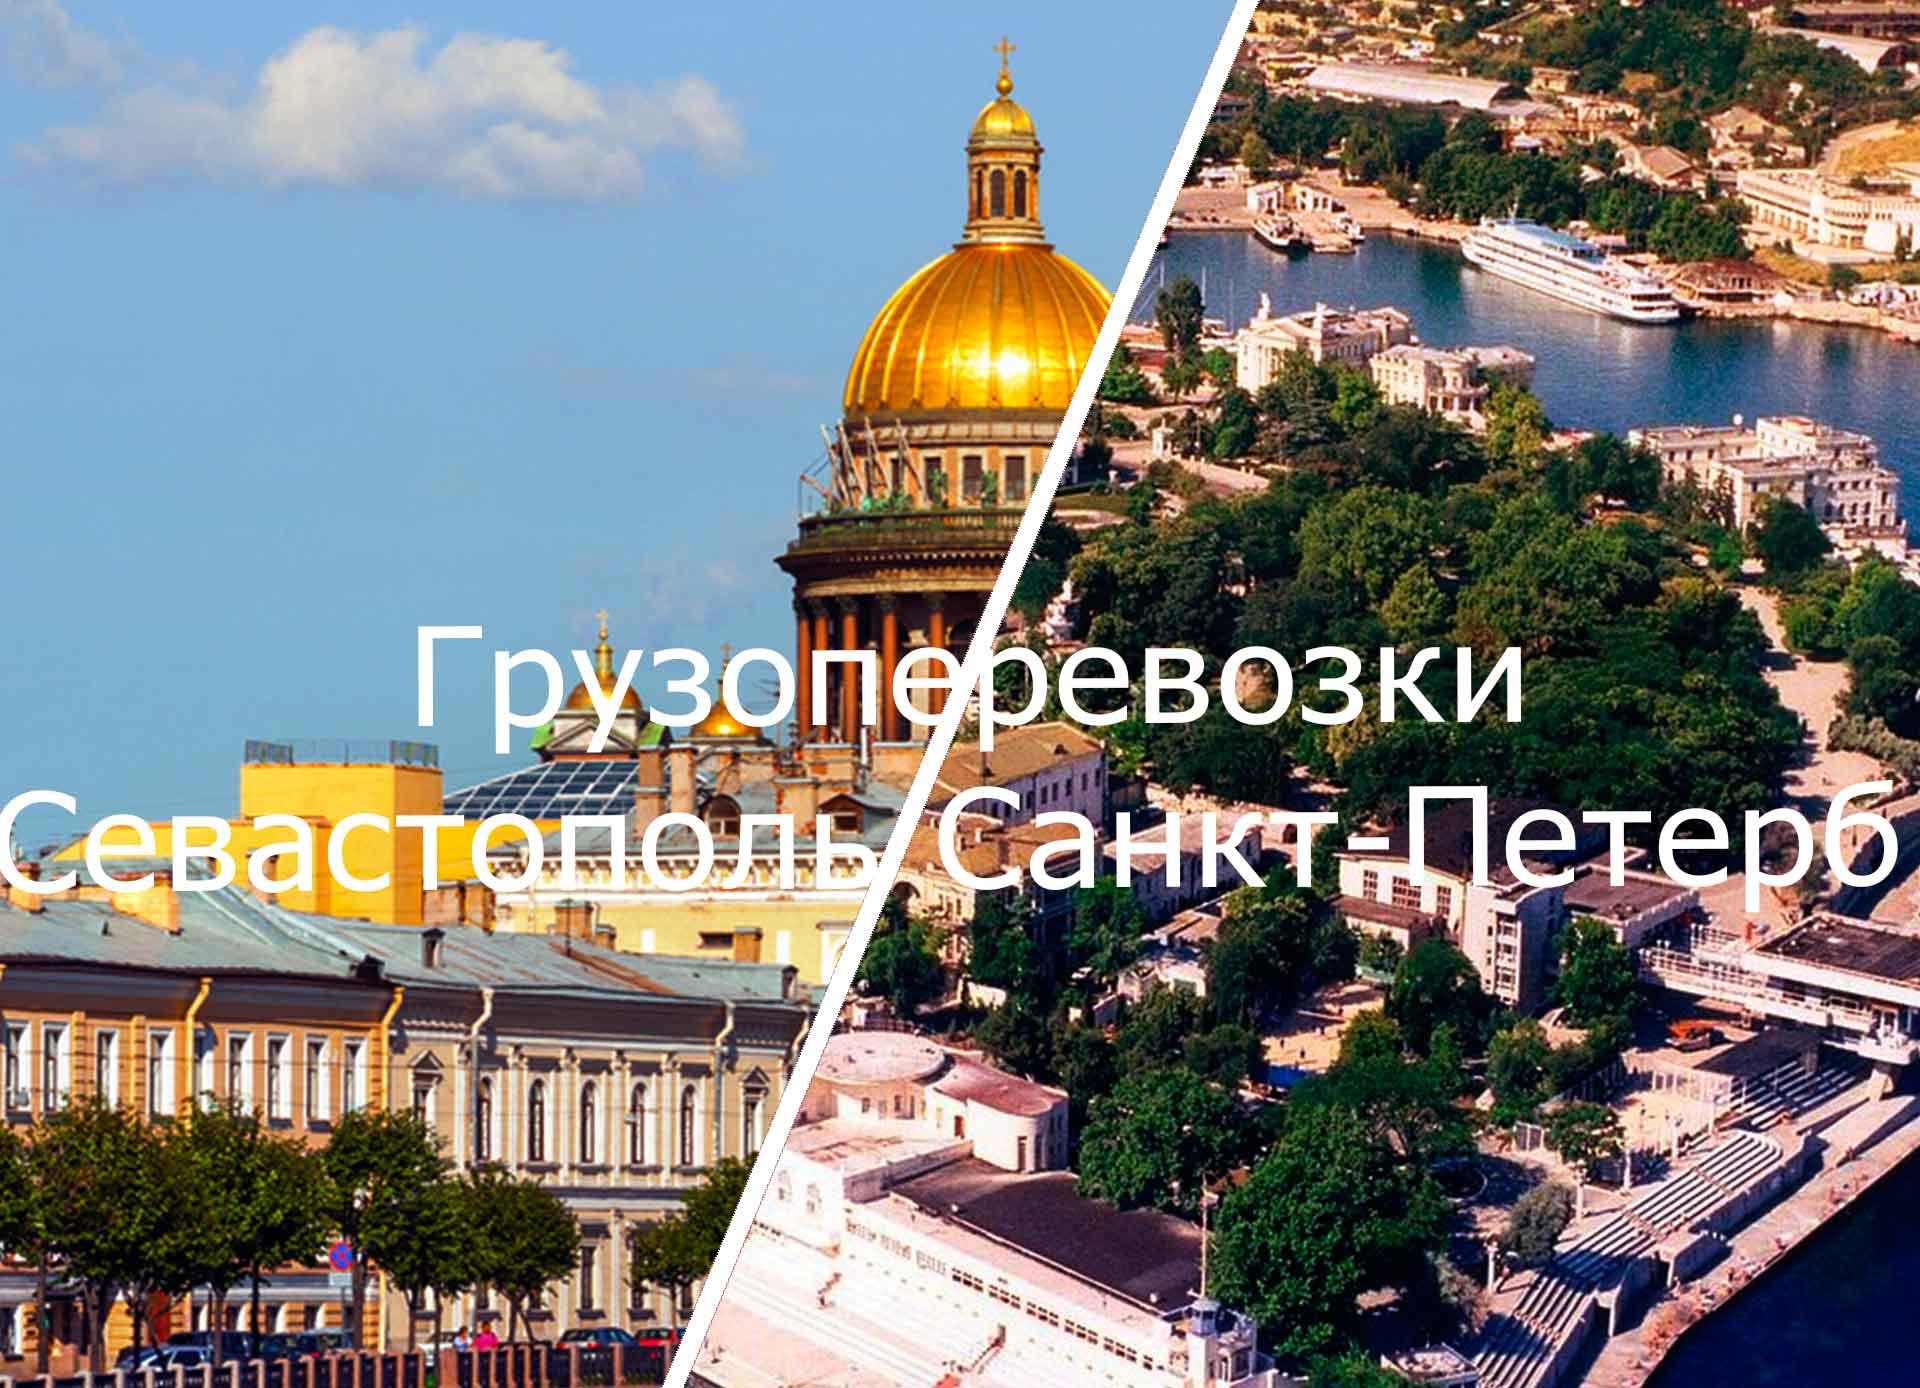 грузоперевозки севастополь санкт петербург